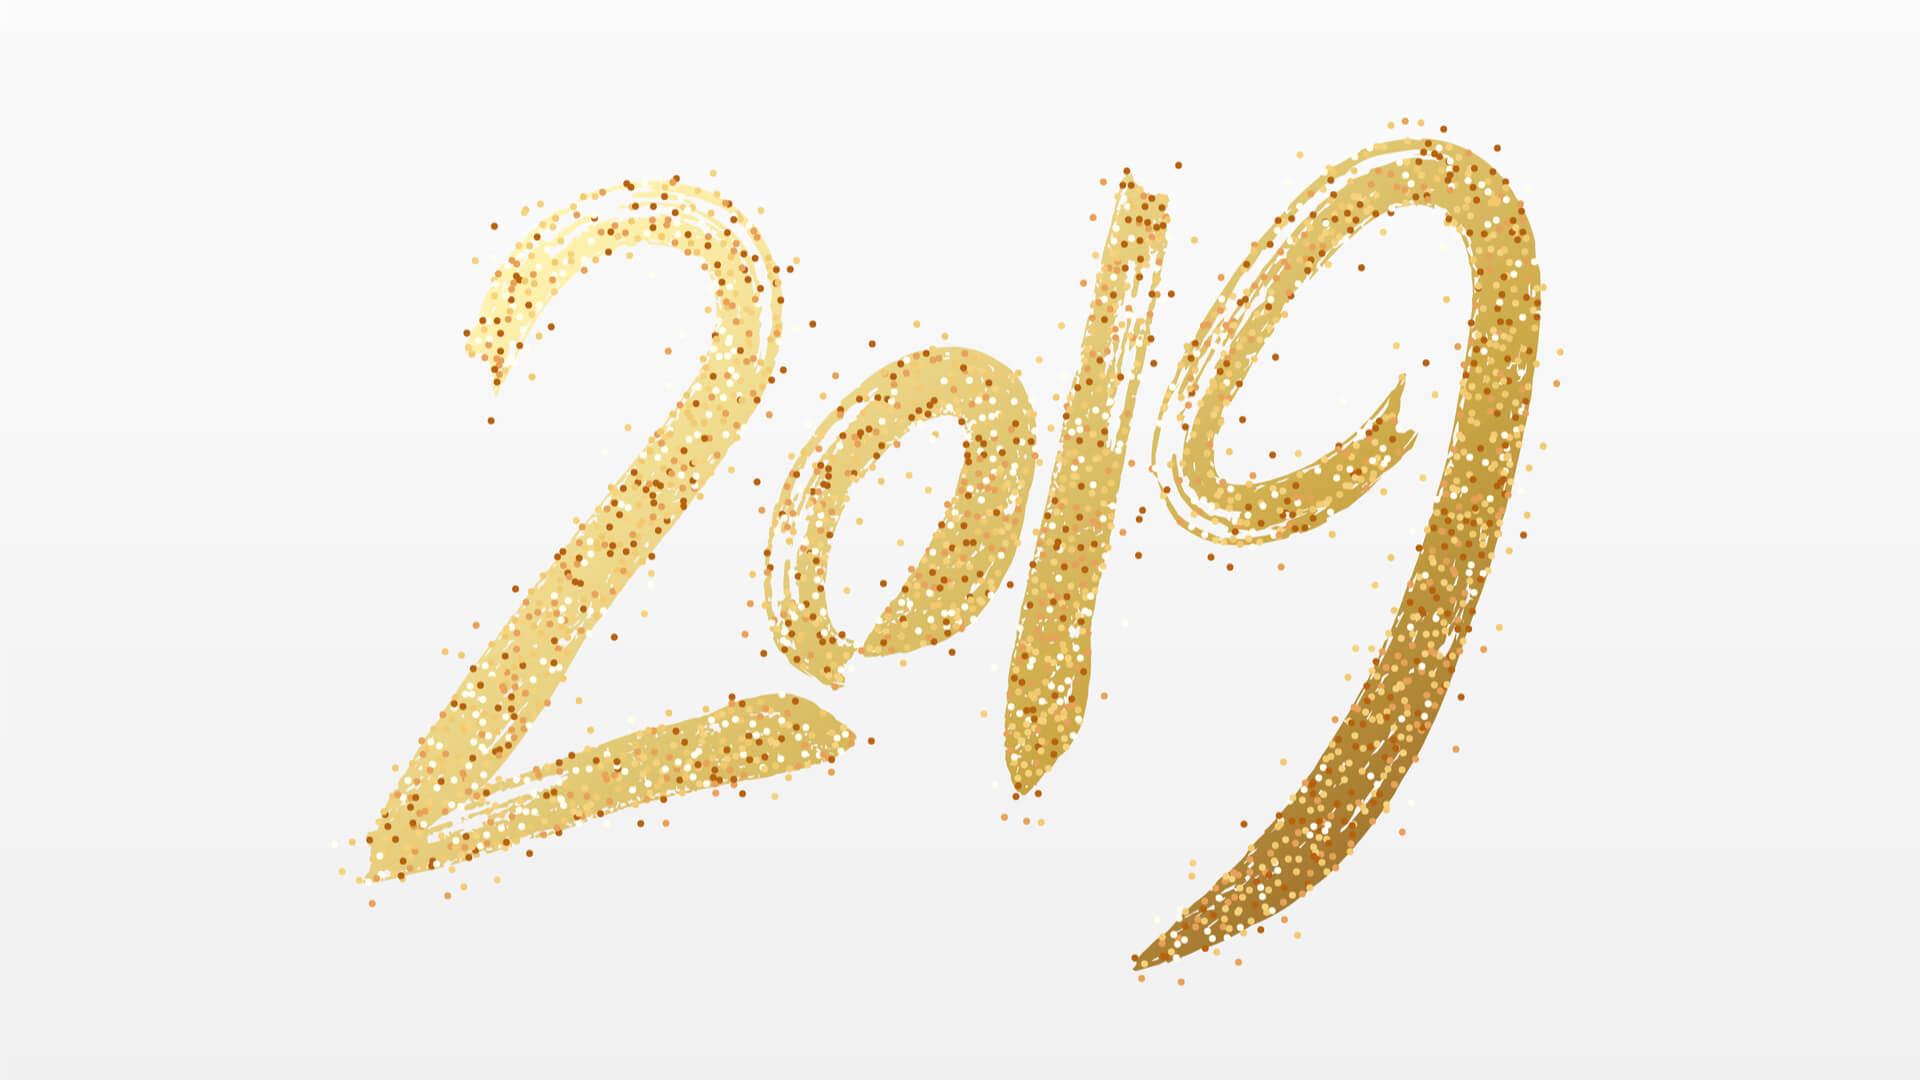 2019 glitter 2